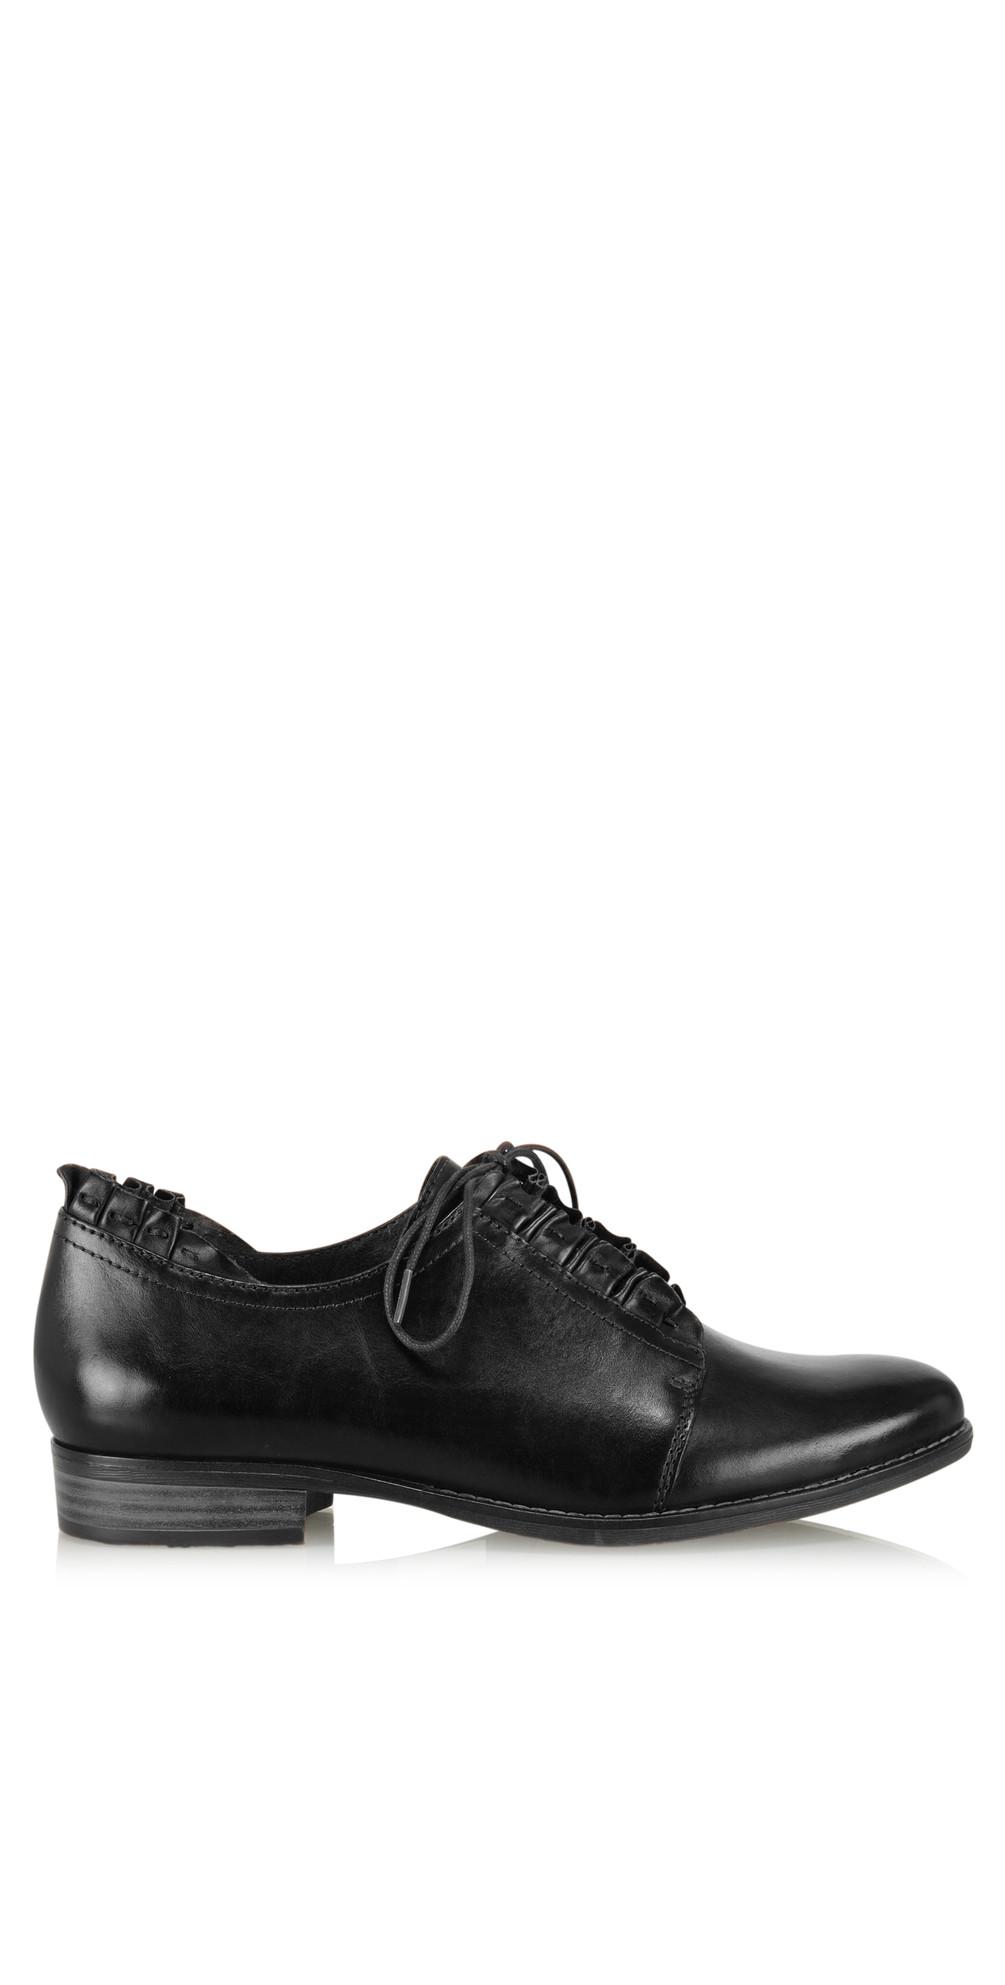 Eleanor Ruffle Shoe main image